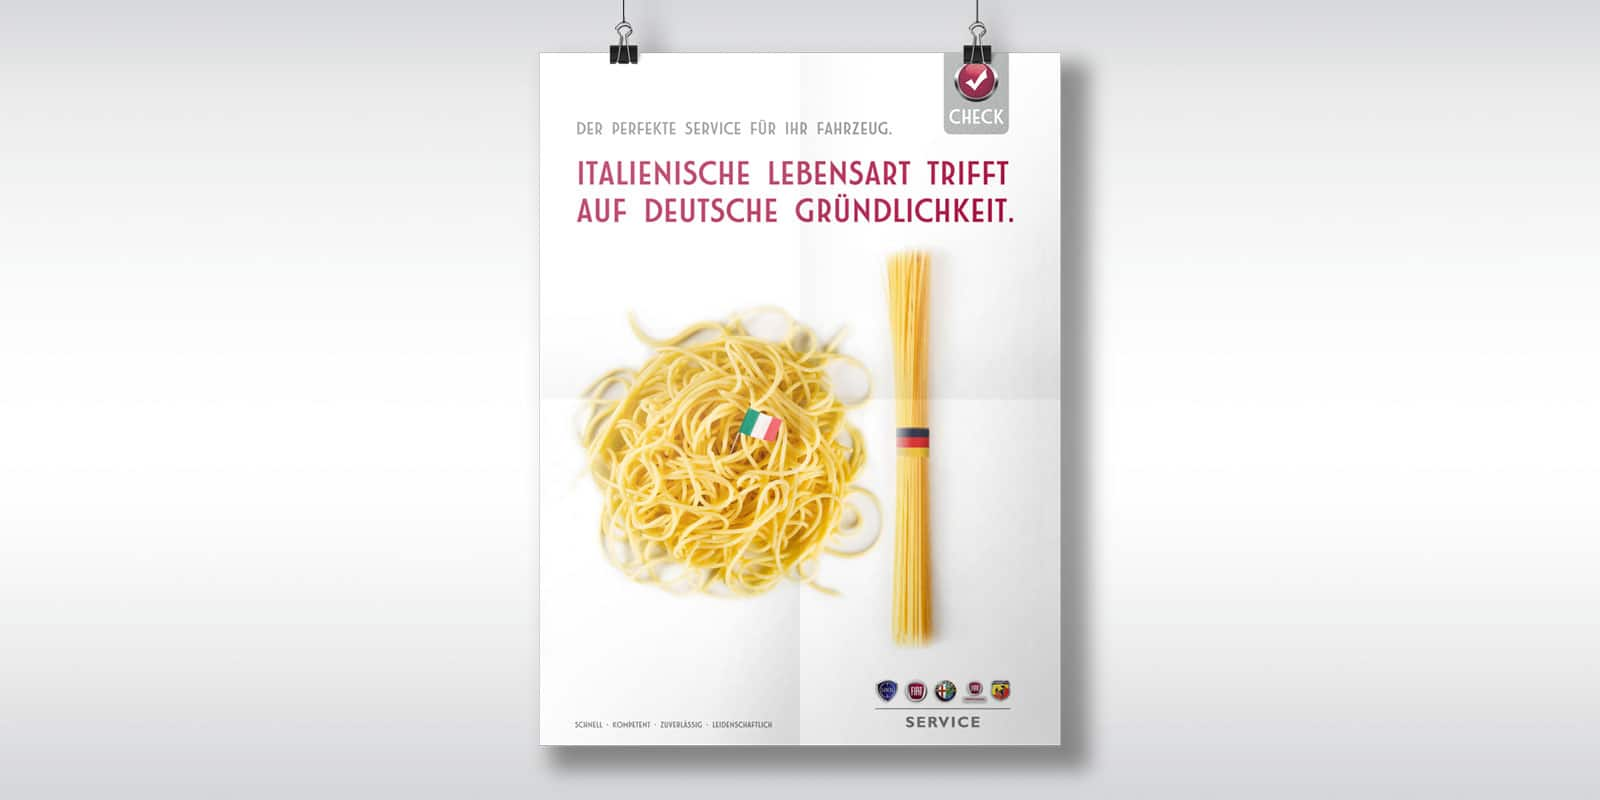 Fiat Group – Kreatividee italienische Lebensart